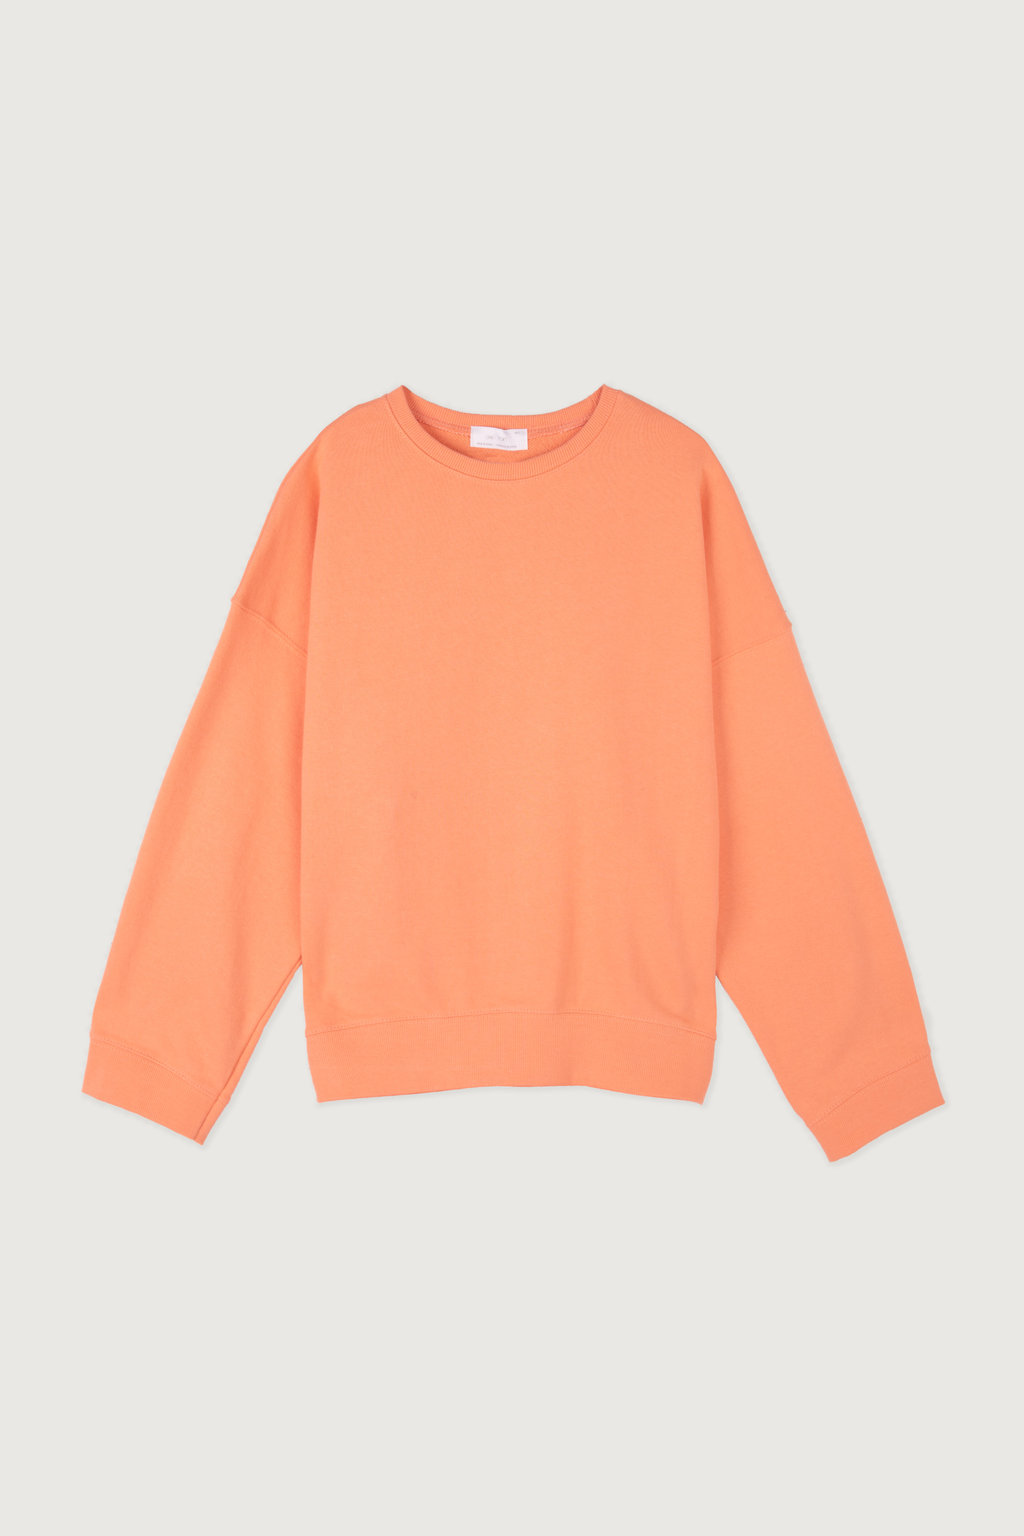 Sweatshirt K147 Orange 5